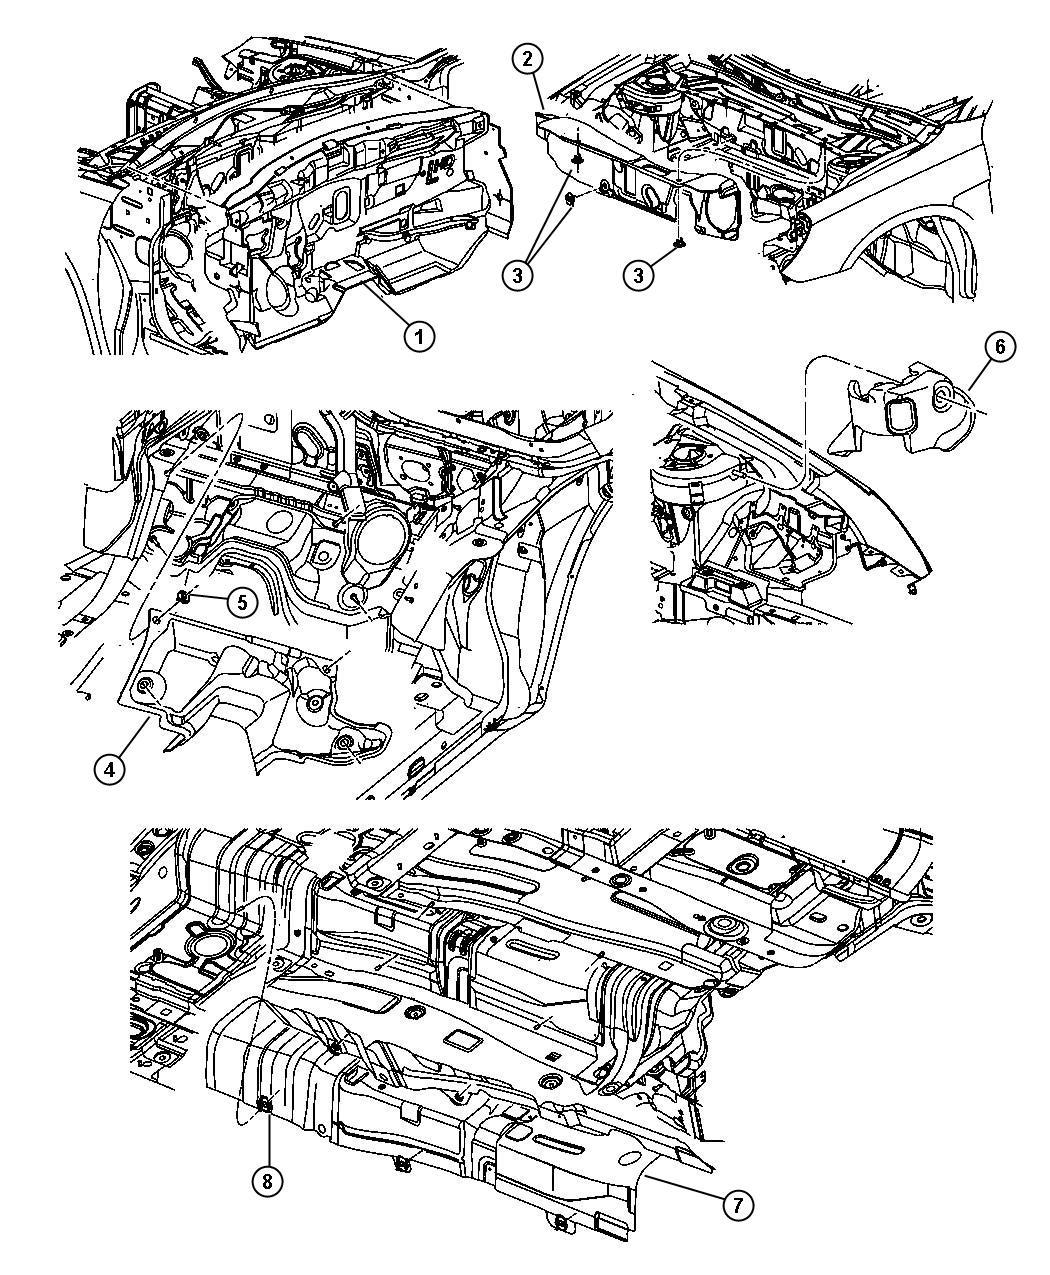 Dodge Avenger Stuffer. Right. Between wheel well brace and